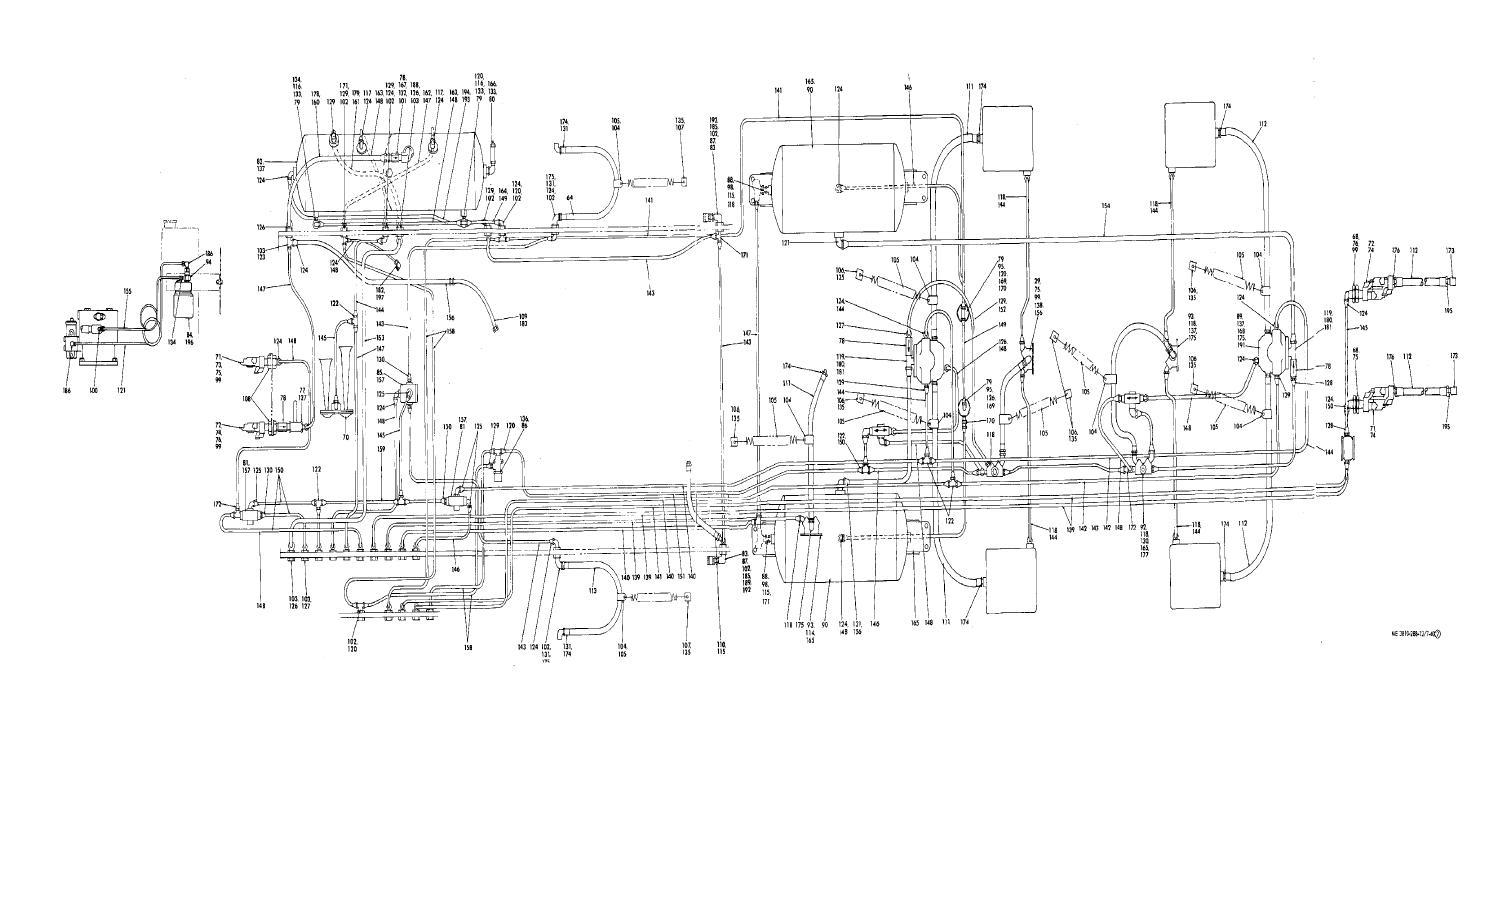 gm turn signal wiring diagram wiring diagram